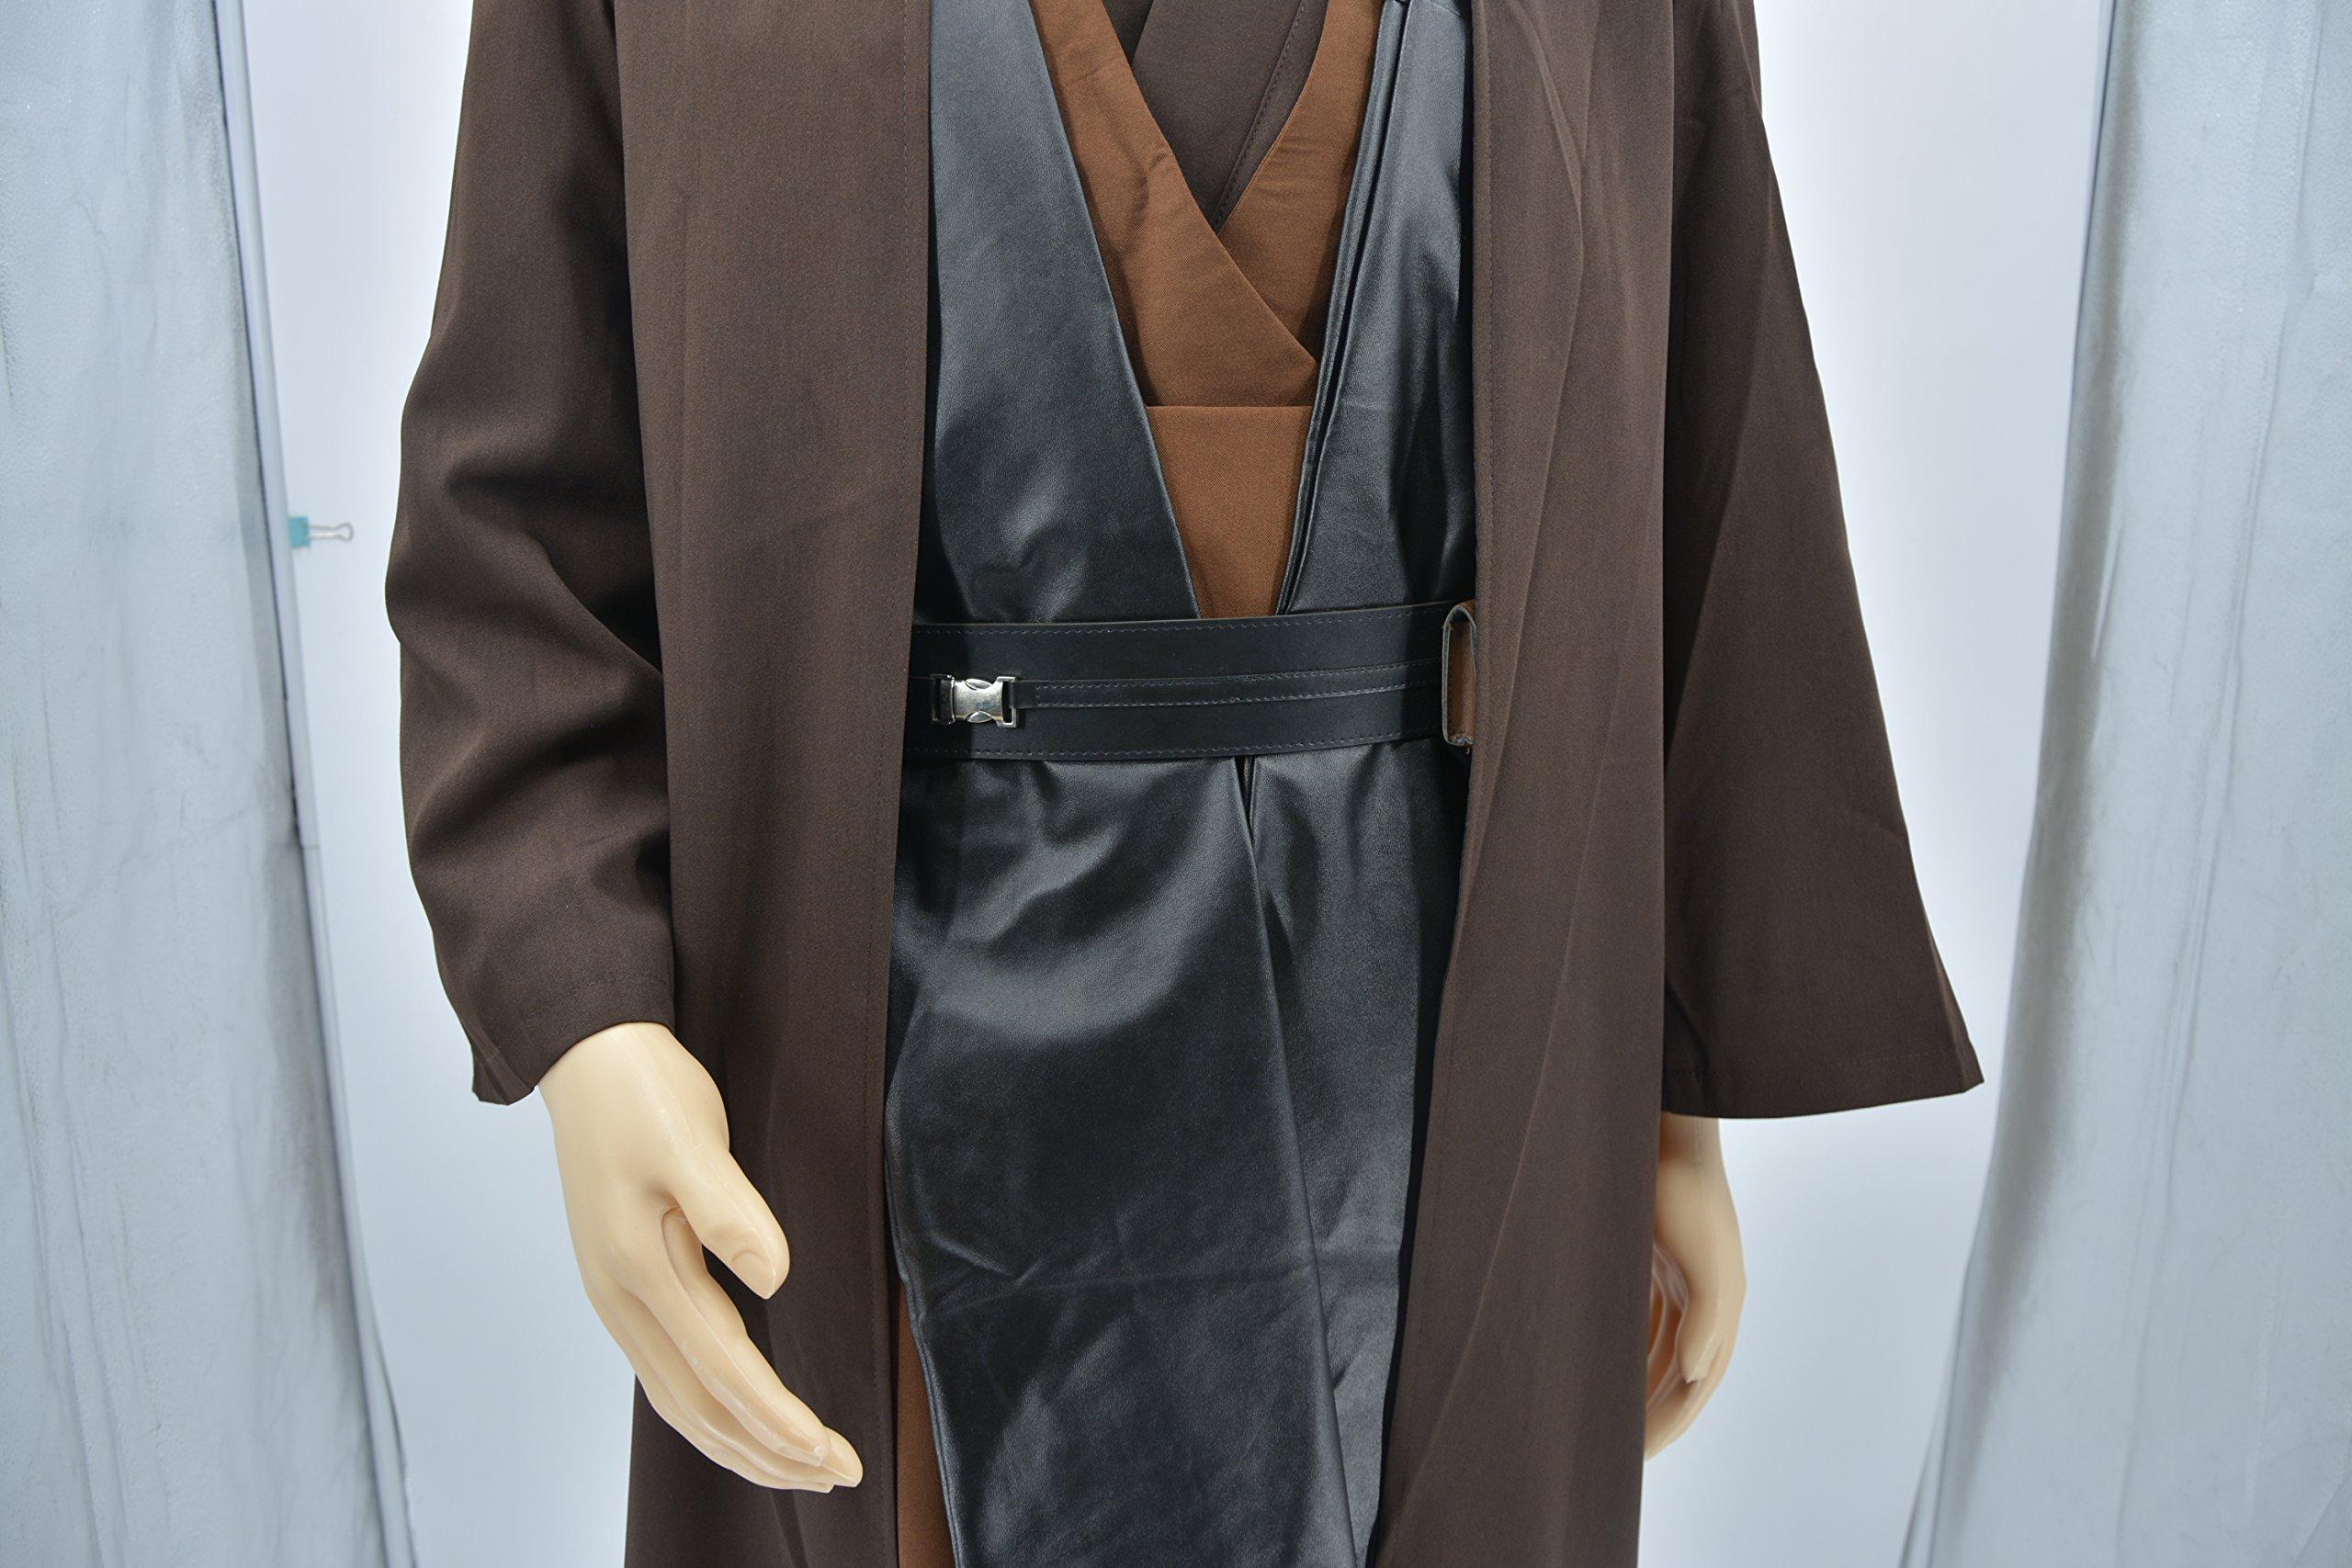 hideaway Star Wars Adult Deluxe Anakin Skywalker Costume [ Size : M, L, XL ] Cosplay (XL) by hideaway (Image #5)